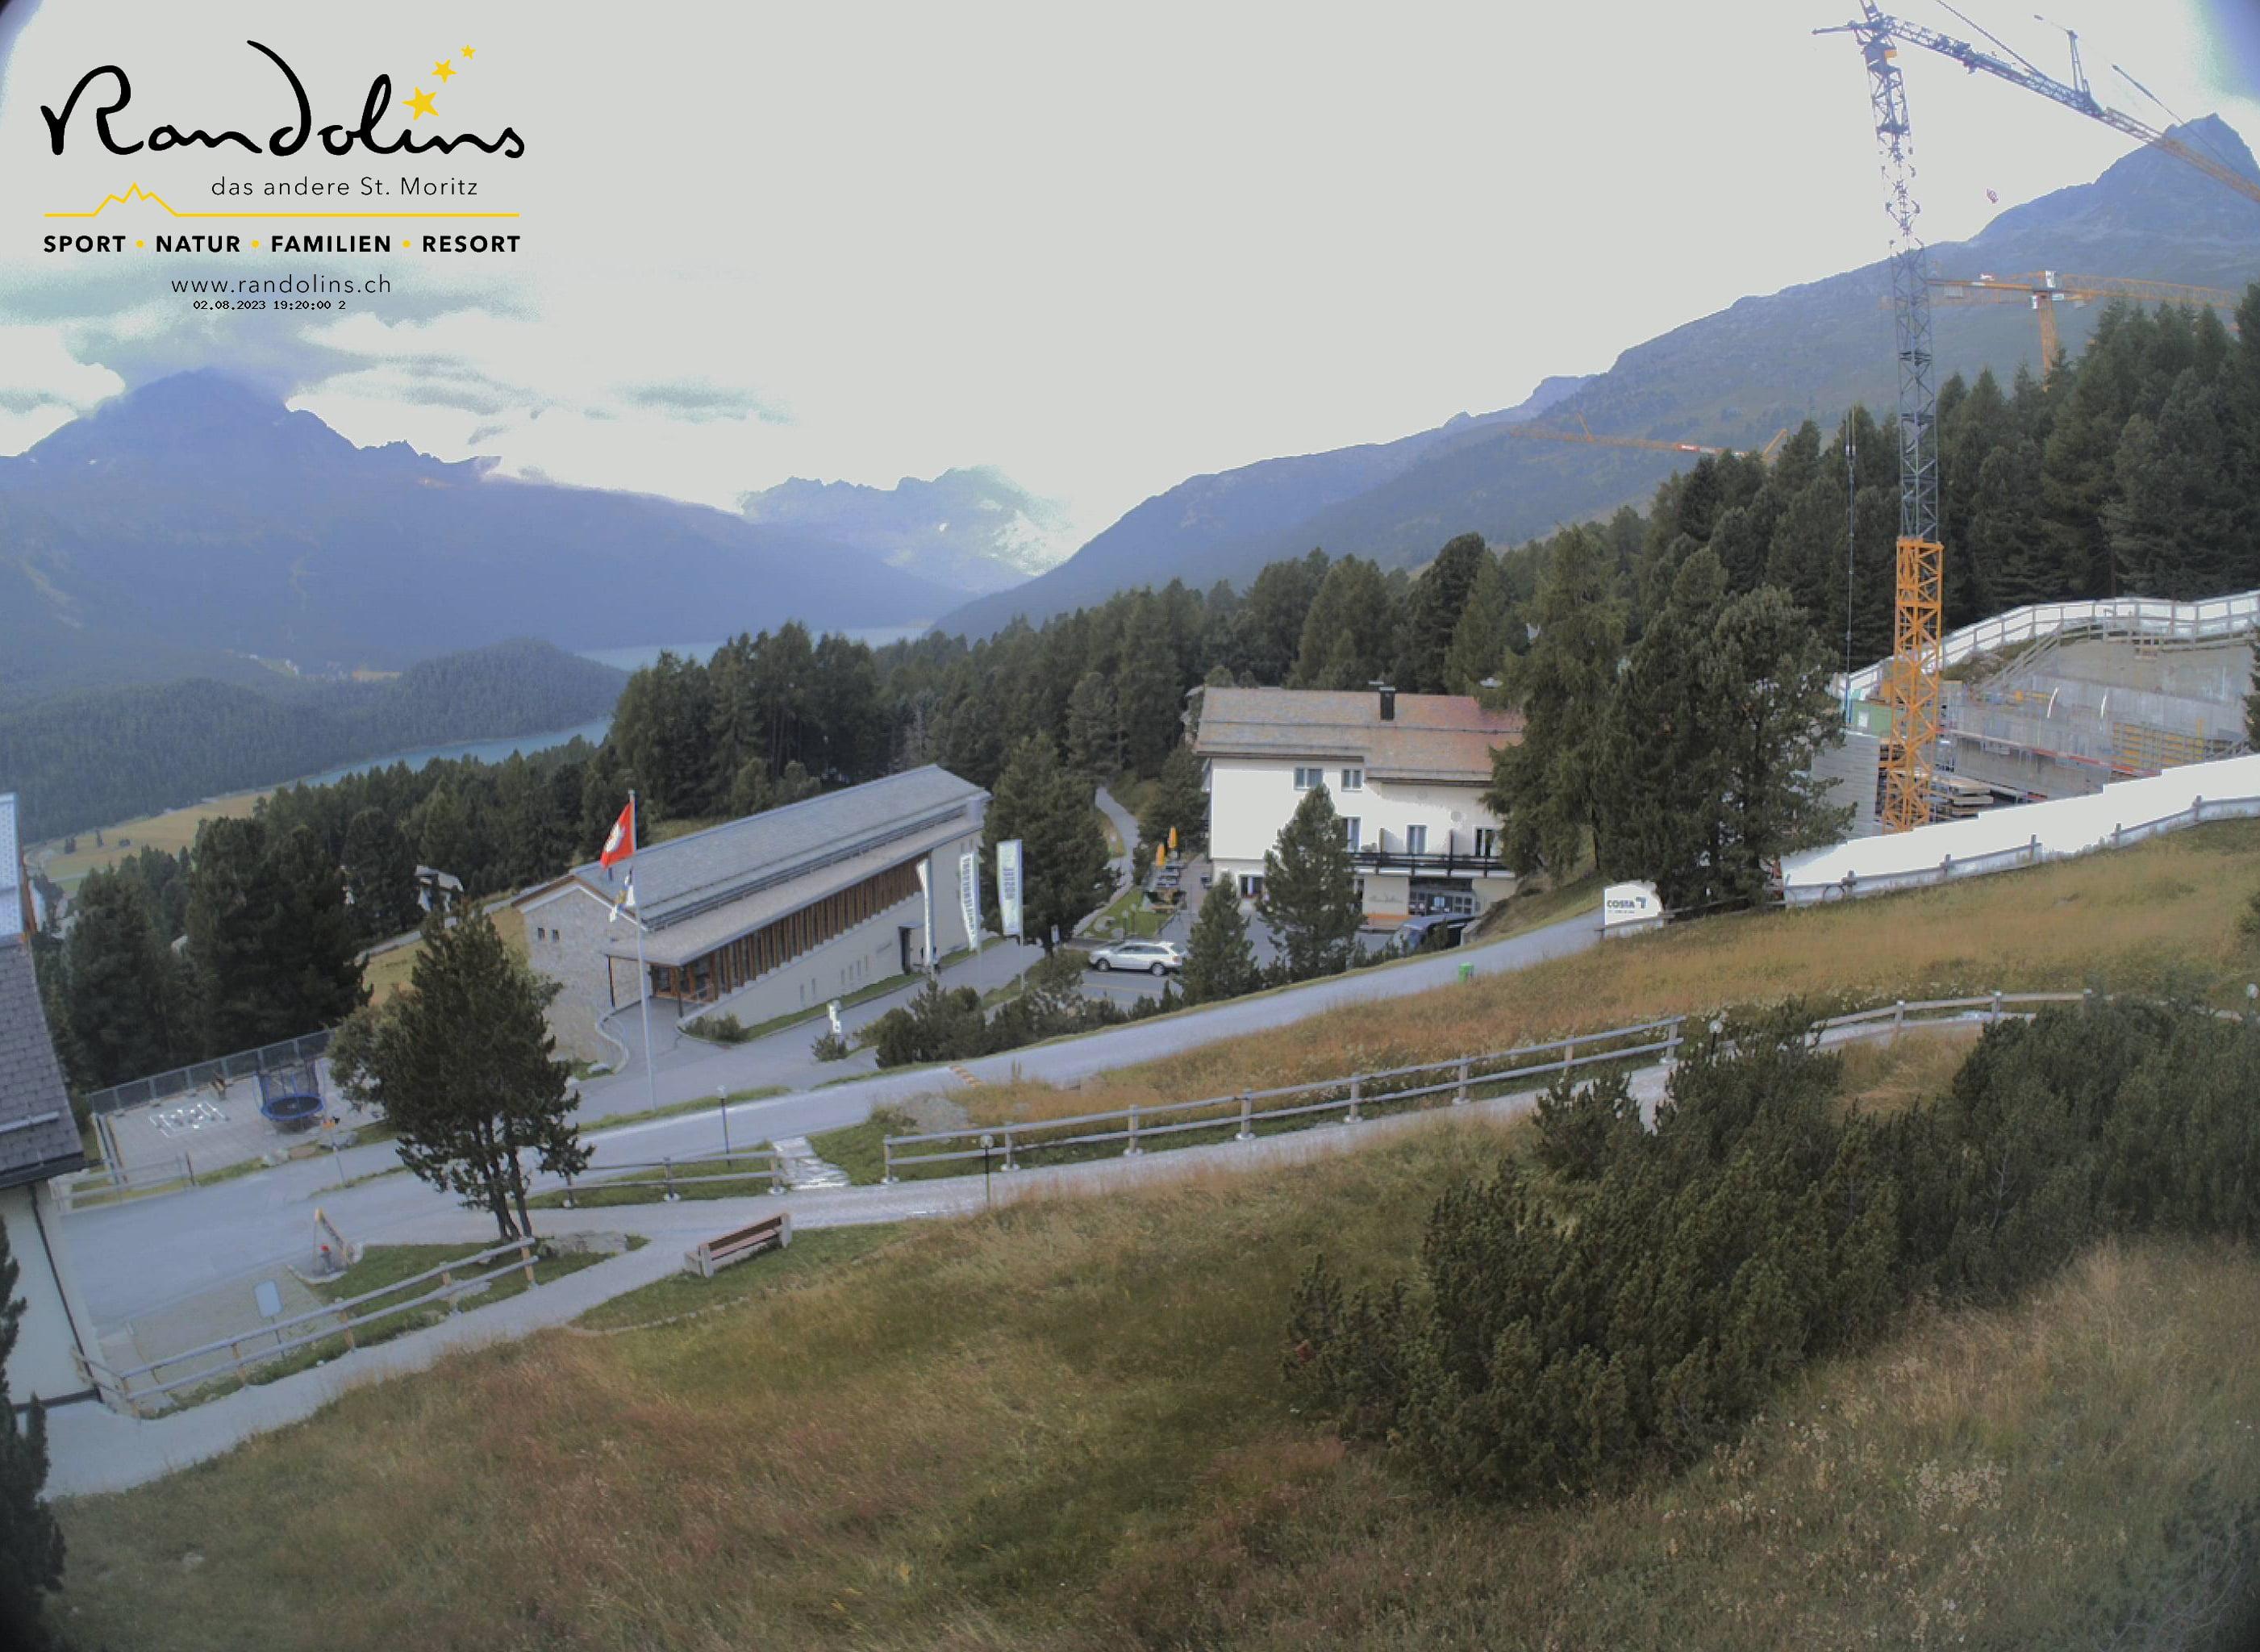 St. Moritz Berghotel Randolins